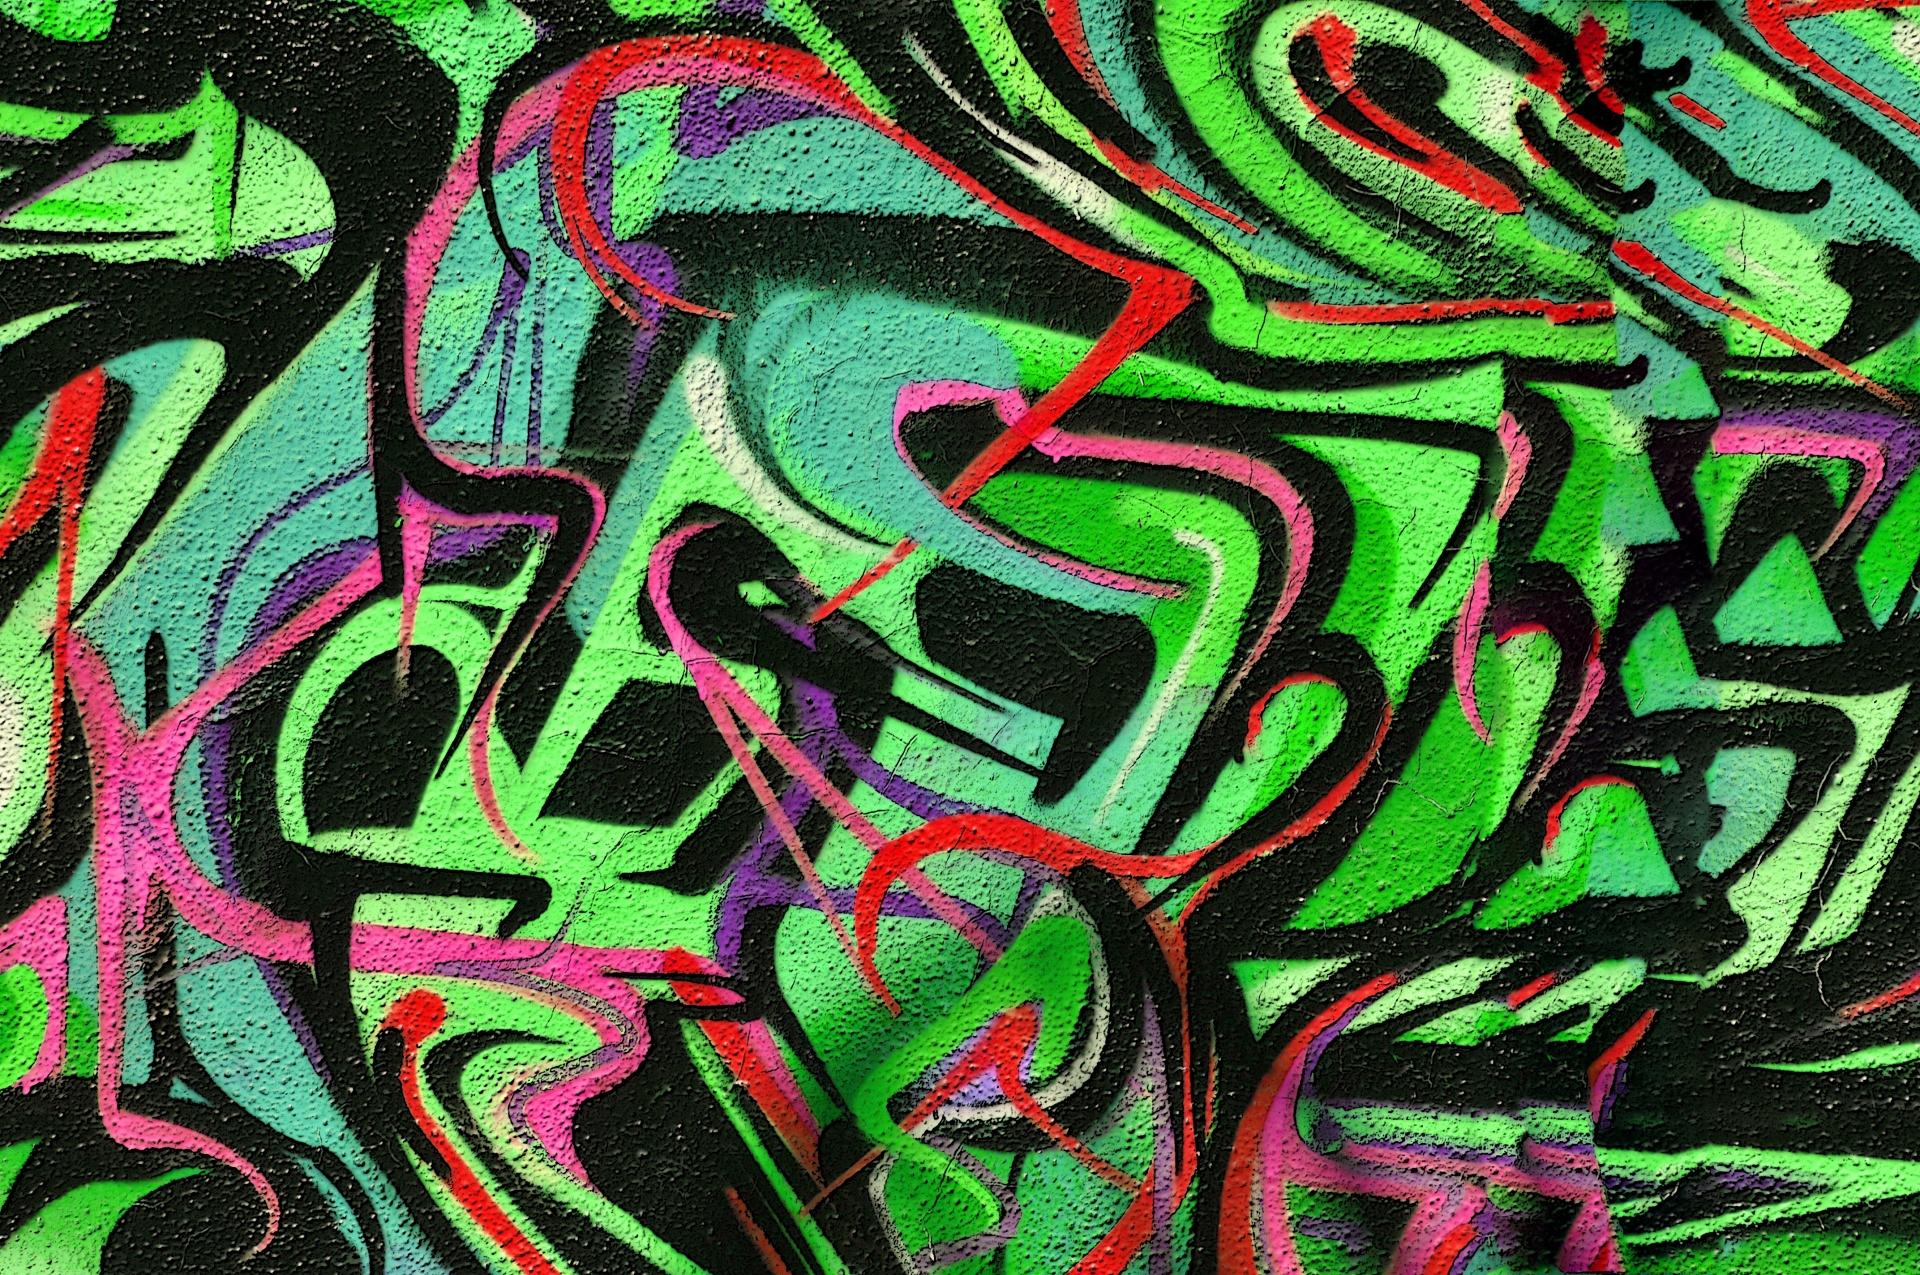 Urban Wallpaper Hd Green Graffiti Background Free Stock Photo Public Domain